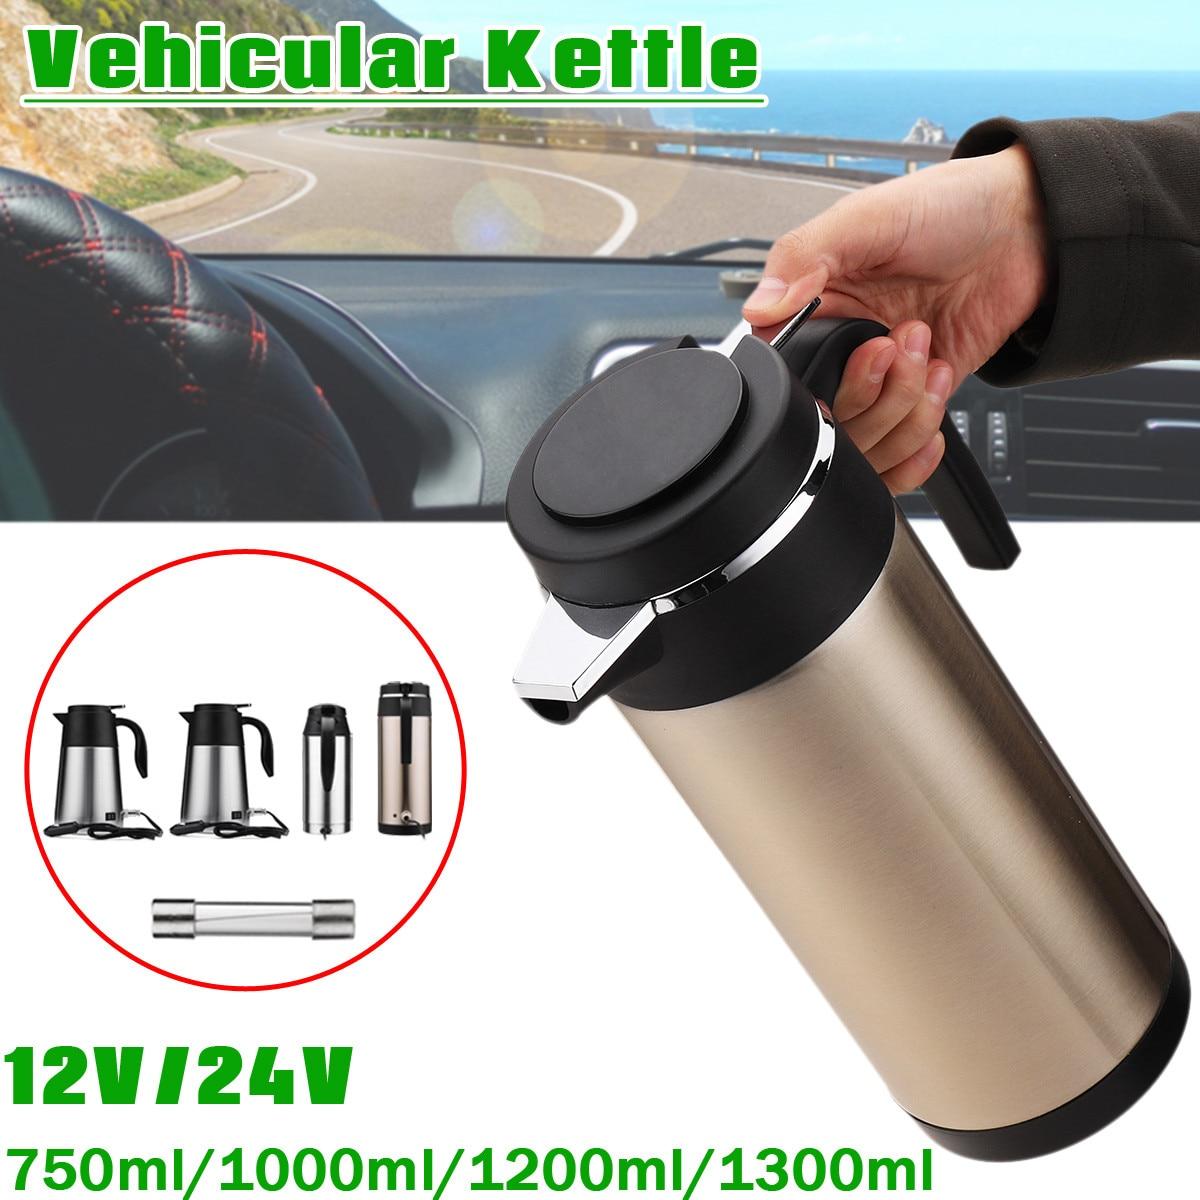 750ml/1000ml/1200ml/1300ml Car Heating Cup Electric Kettle Pot Camping Travel Trip Coffee Tea Water Heated Mug Boiling 12/24v